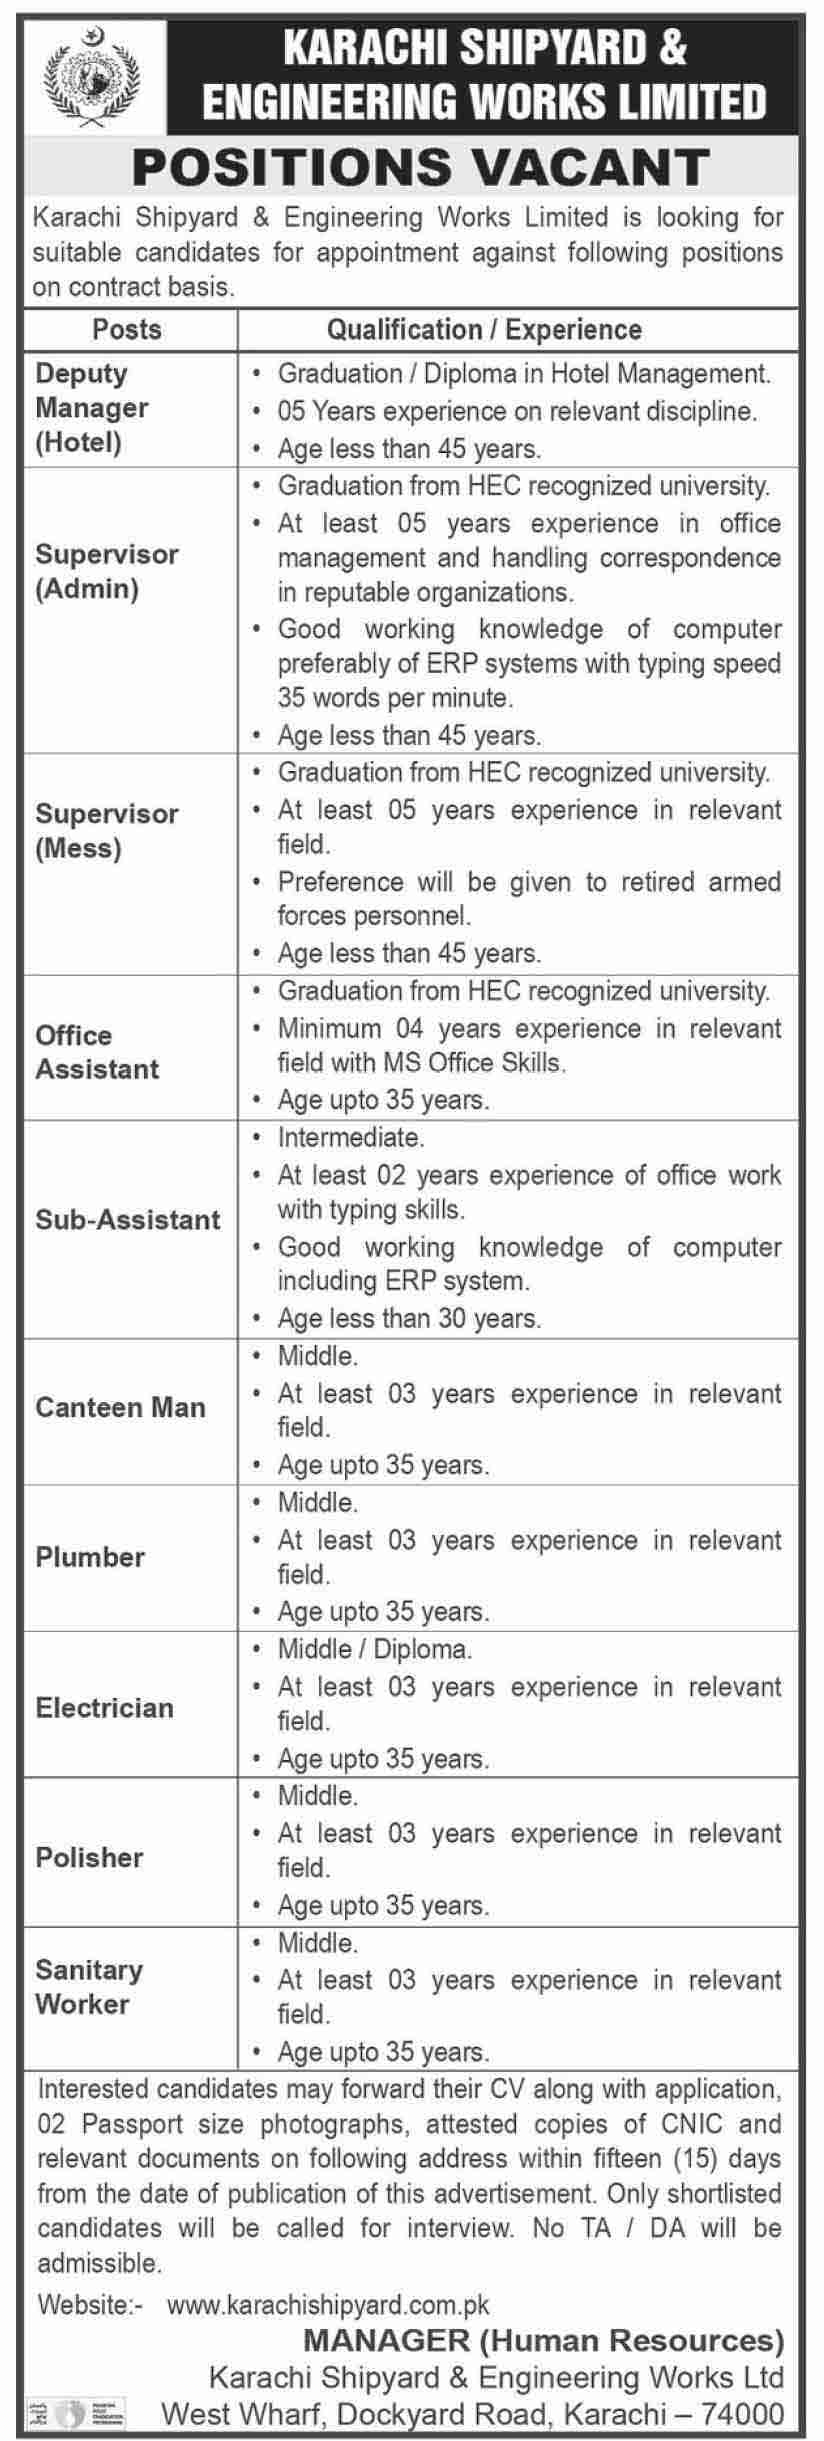 Karachi Shipyard & Engineering Works Limited April 2021